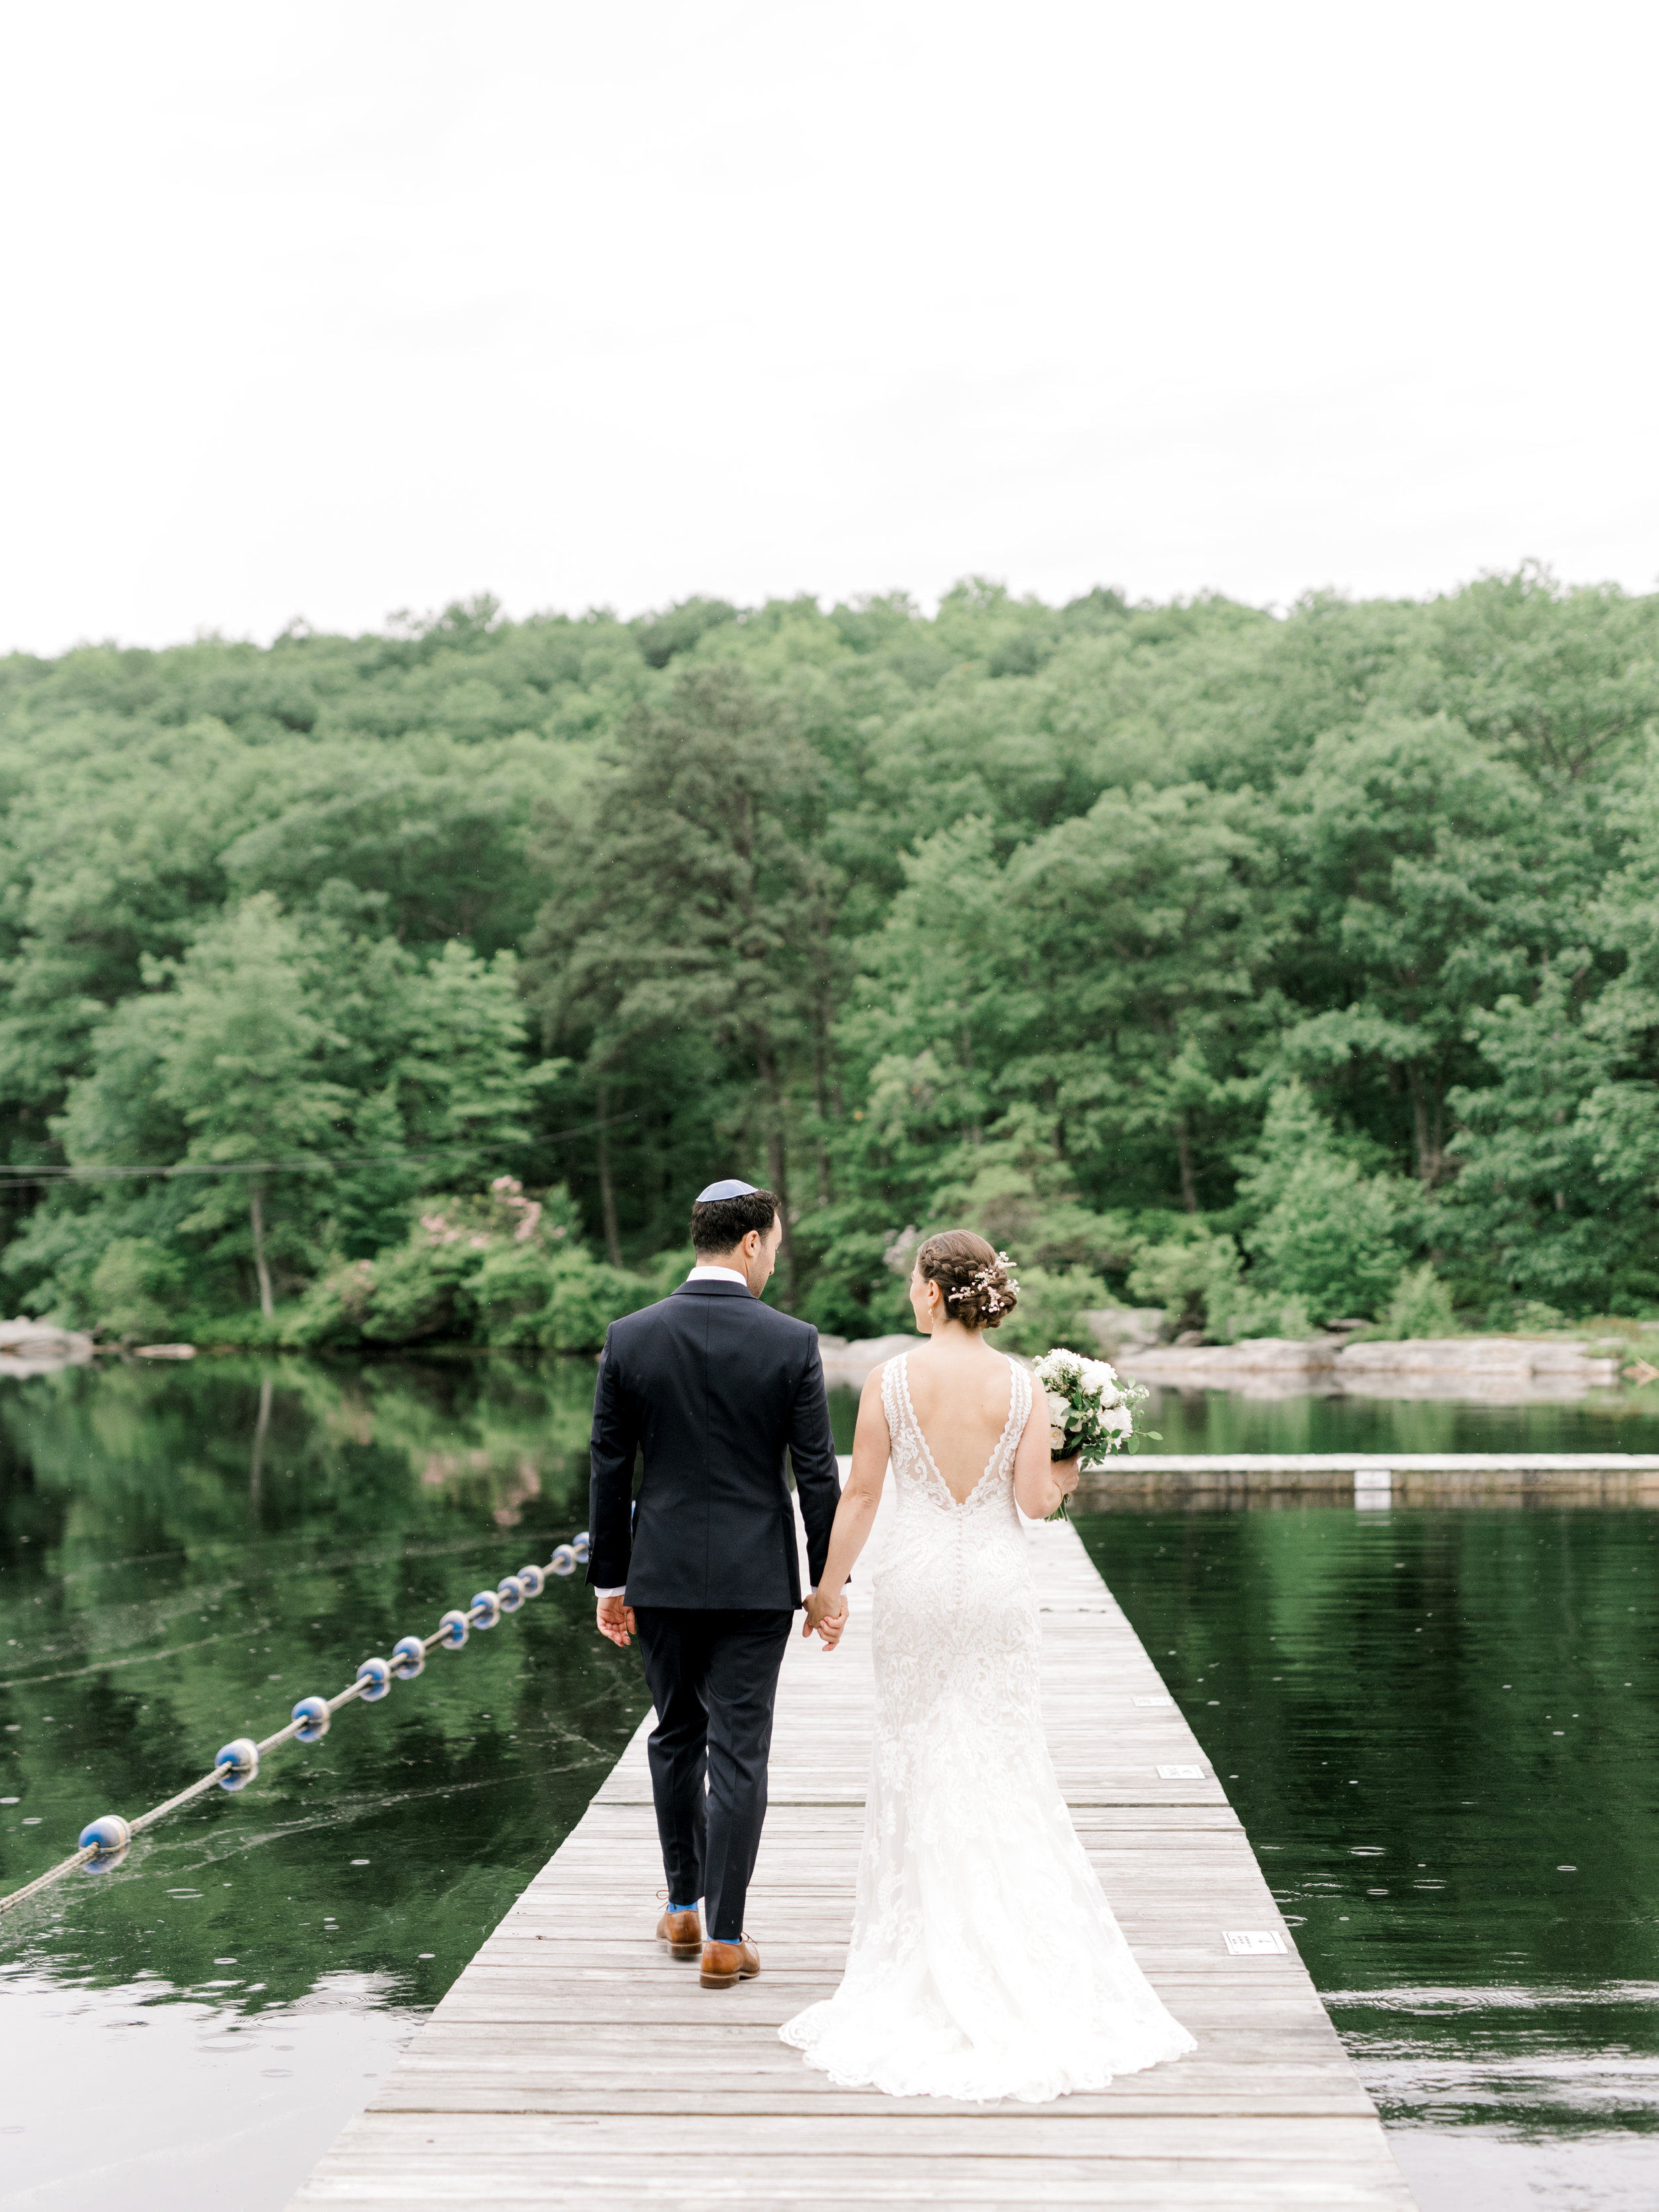 haley-richter-photo-cedar-lakes-estate-wedding-photos-040.jpg